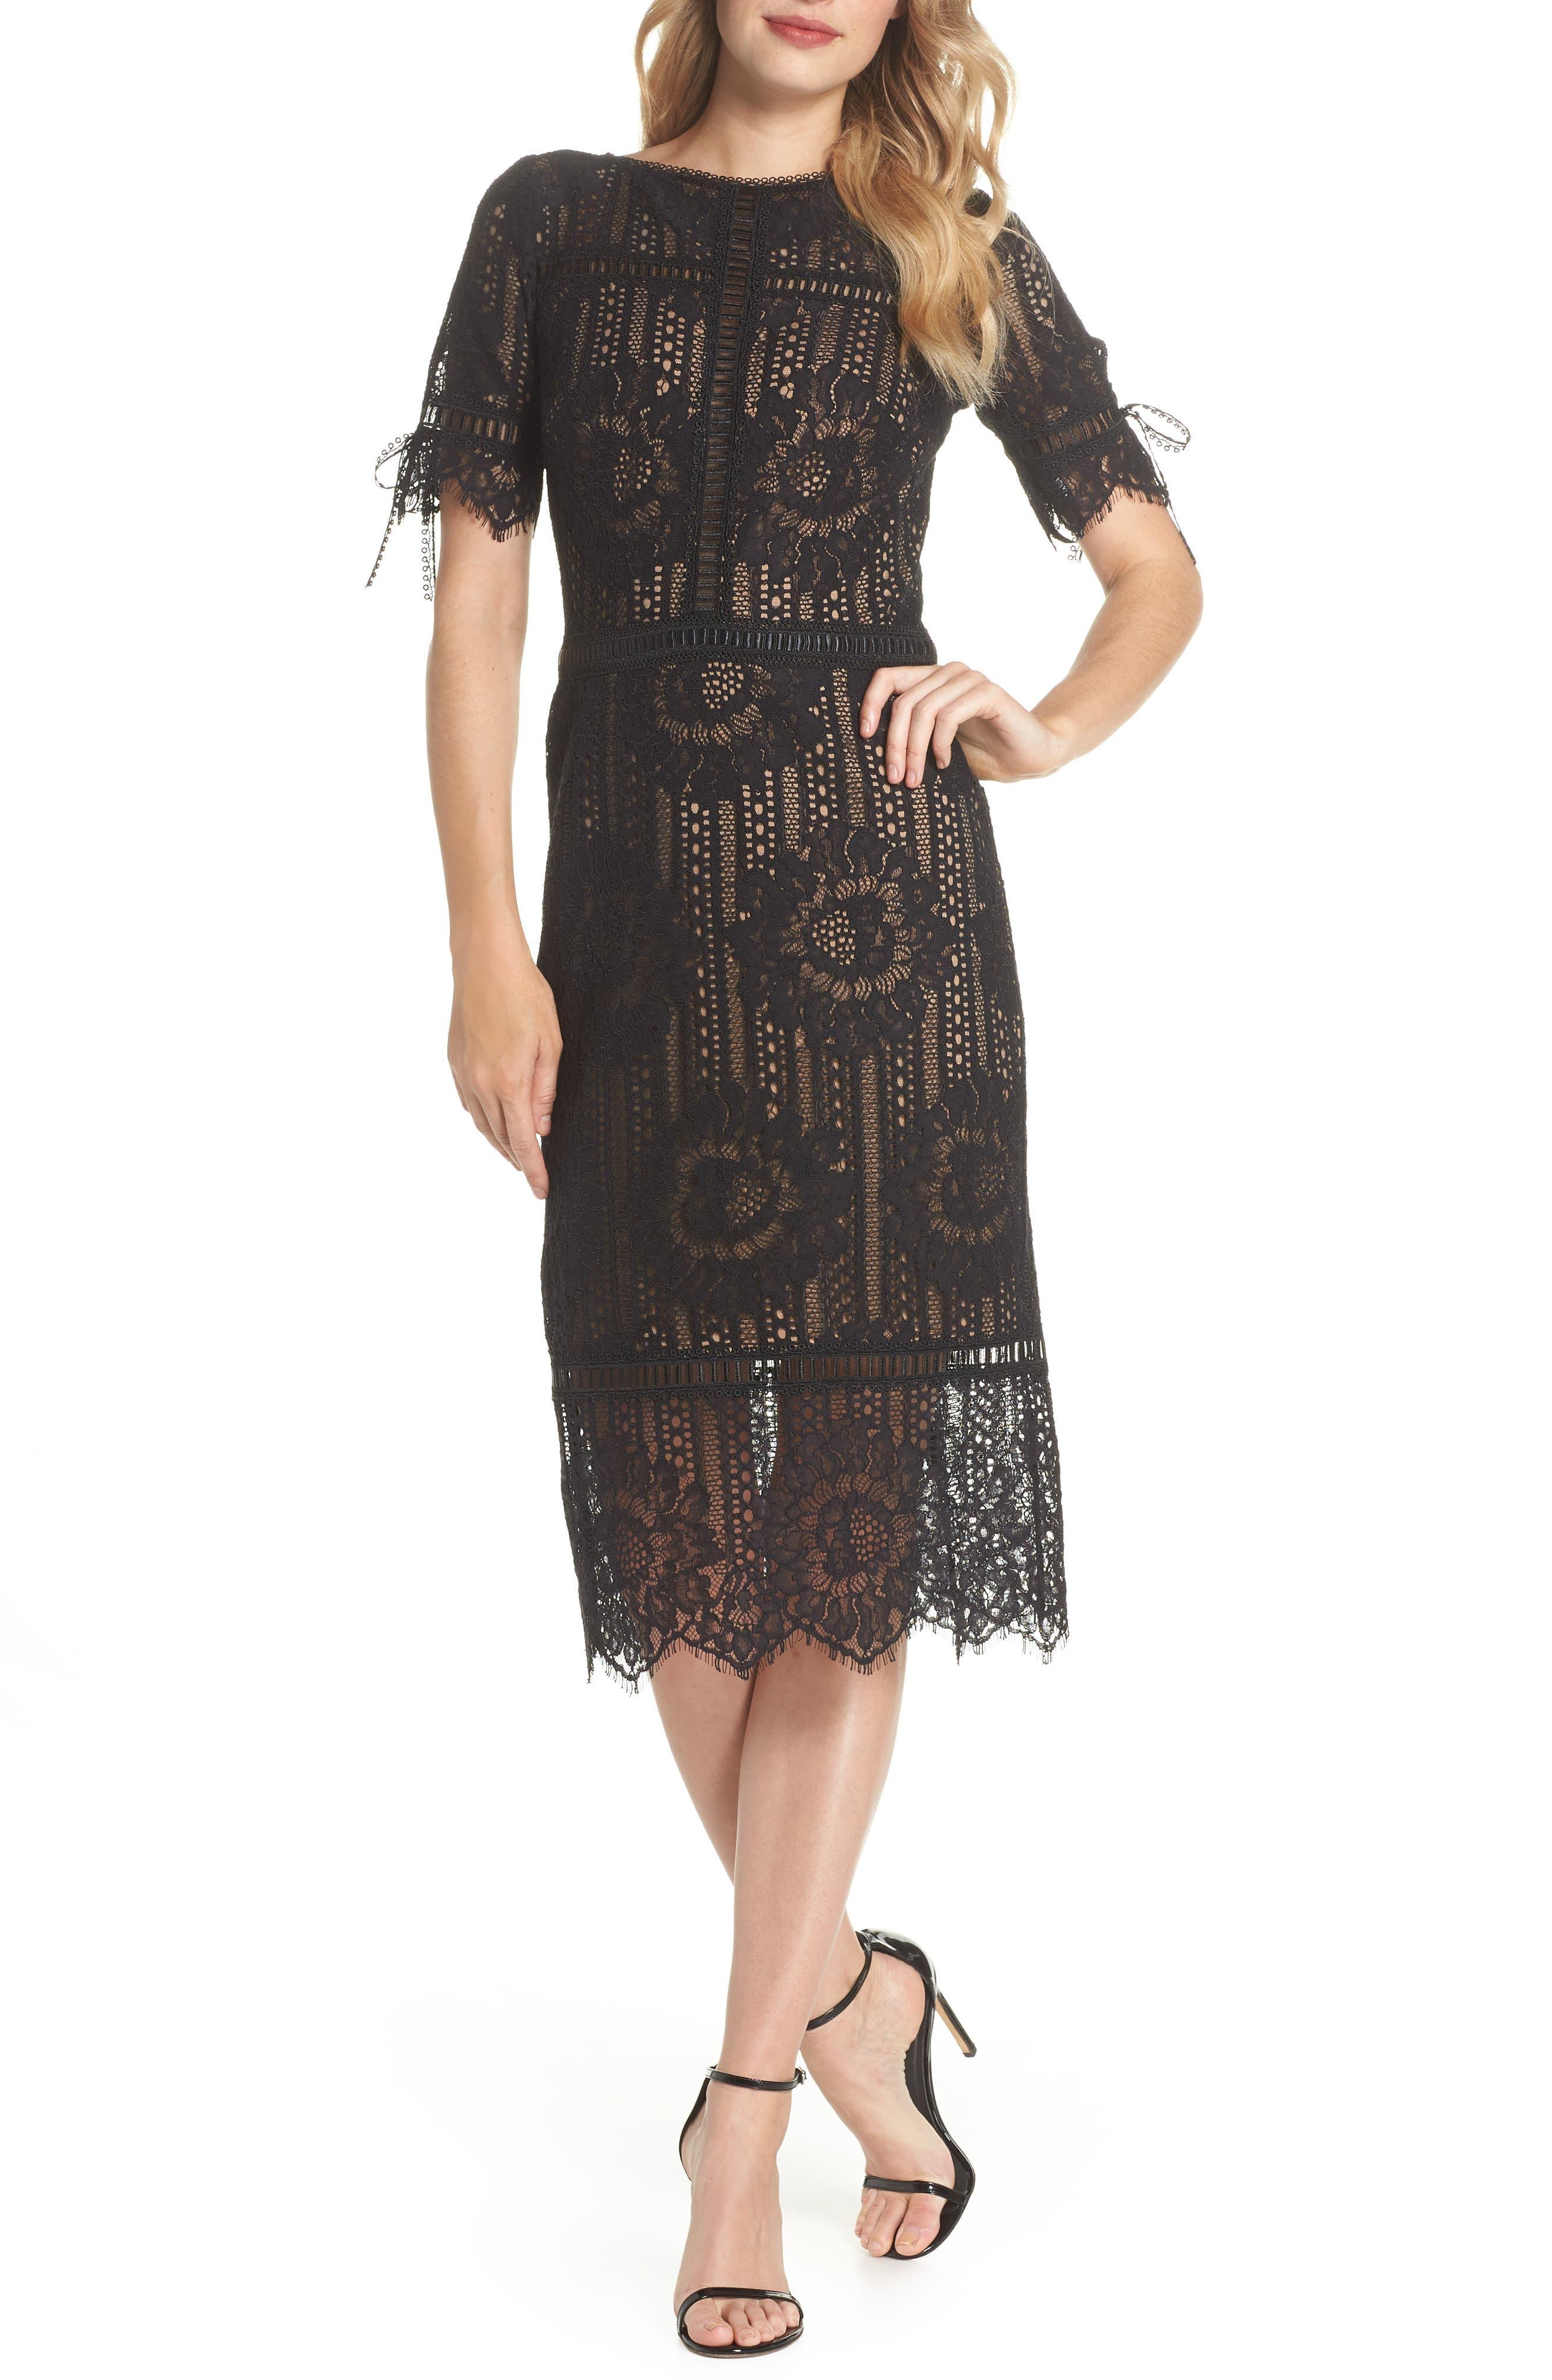 Tie Sleeve Lace Dress,                             Main thumbnail 1, color,                             Black/ Nude